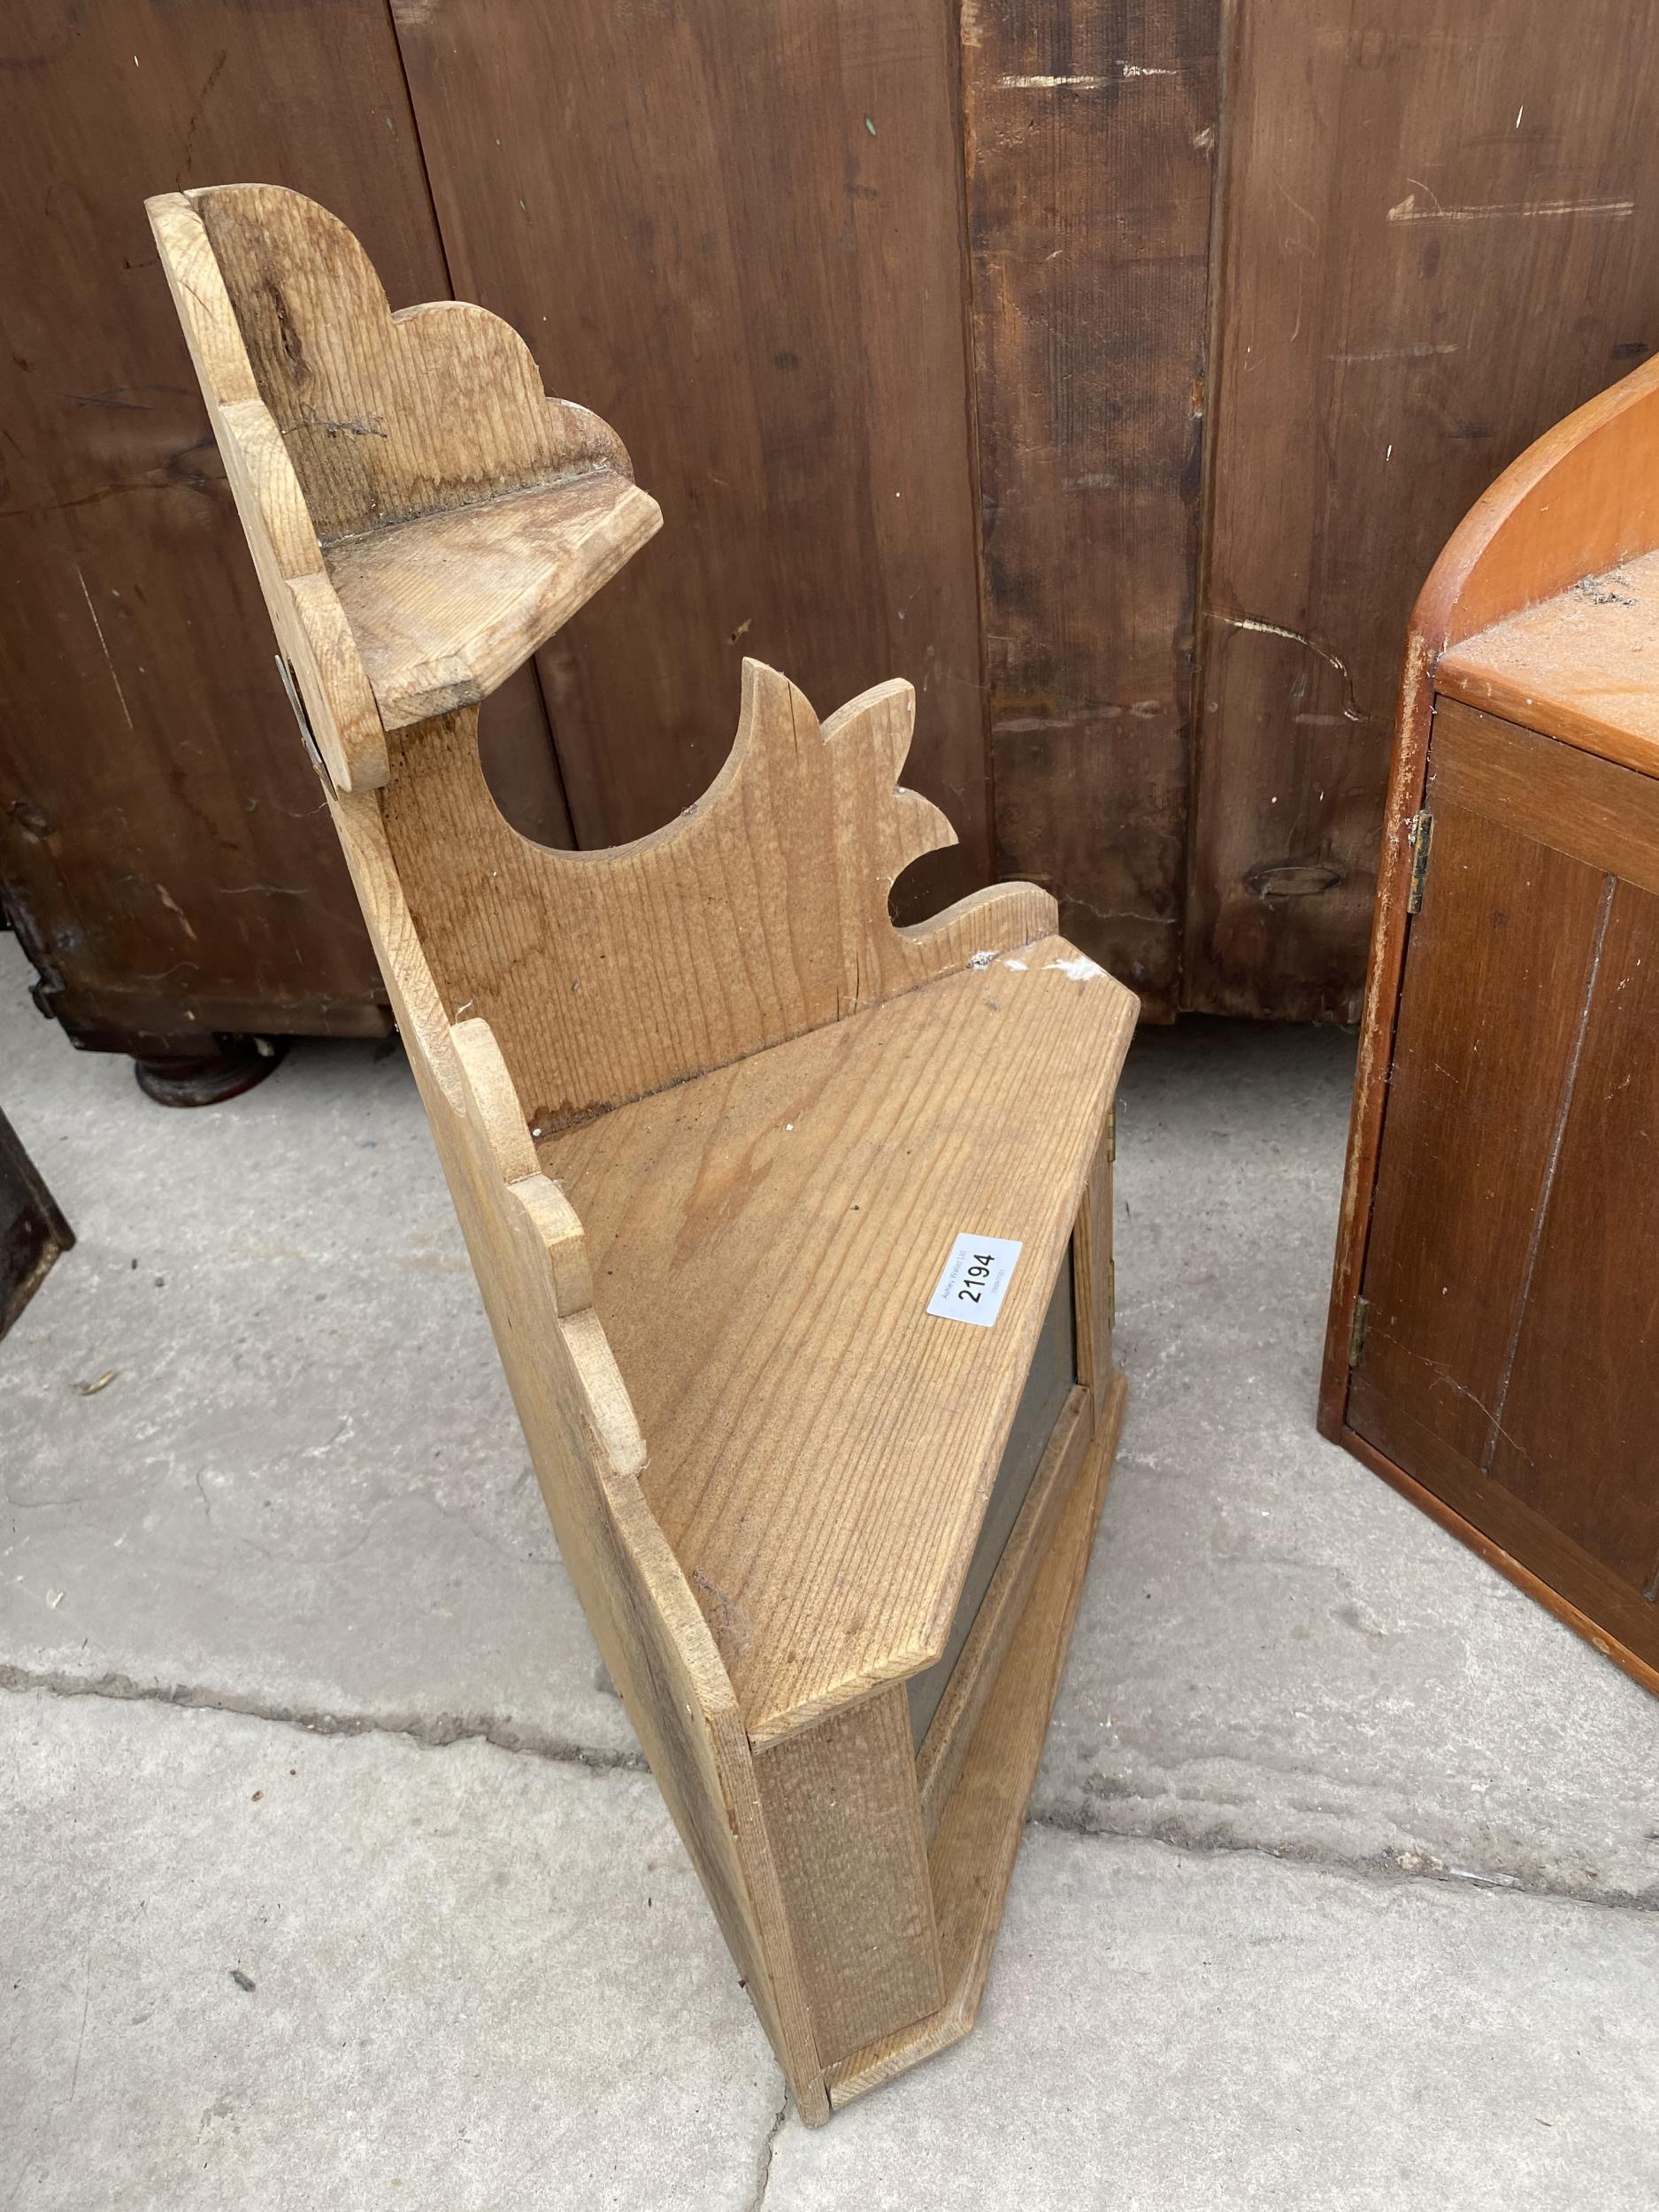 A PINE CORNER SHELF AND TWO DOOR WALL CUPBOARD - Image 2 of 3